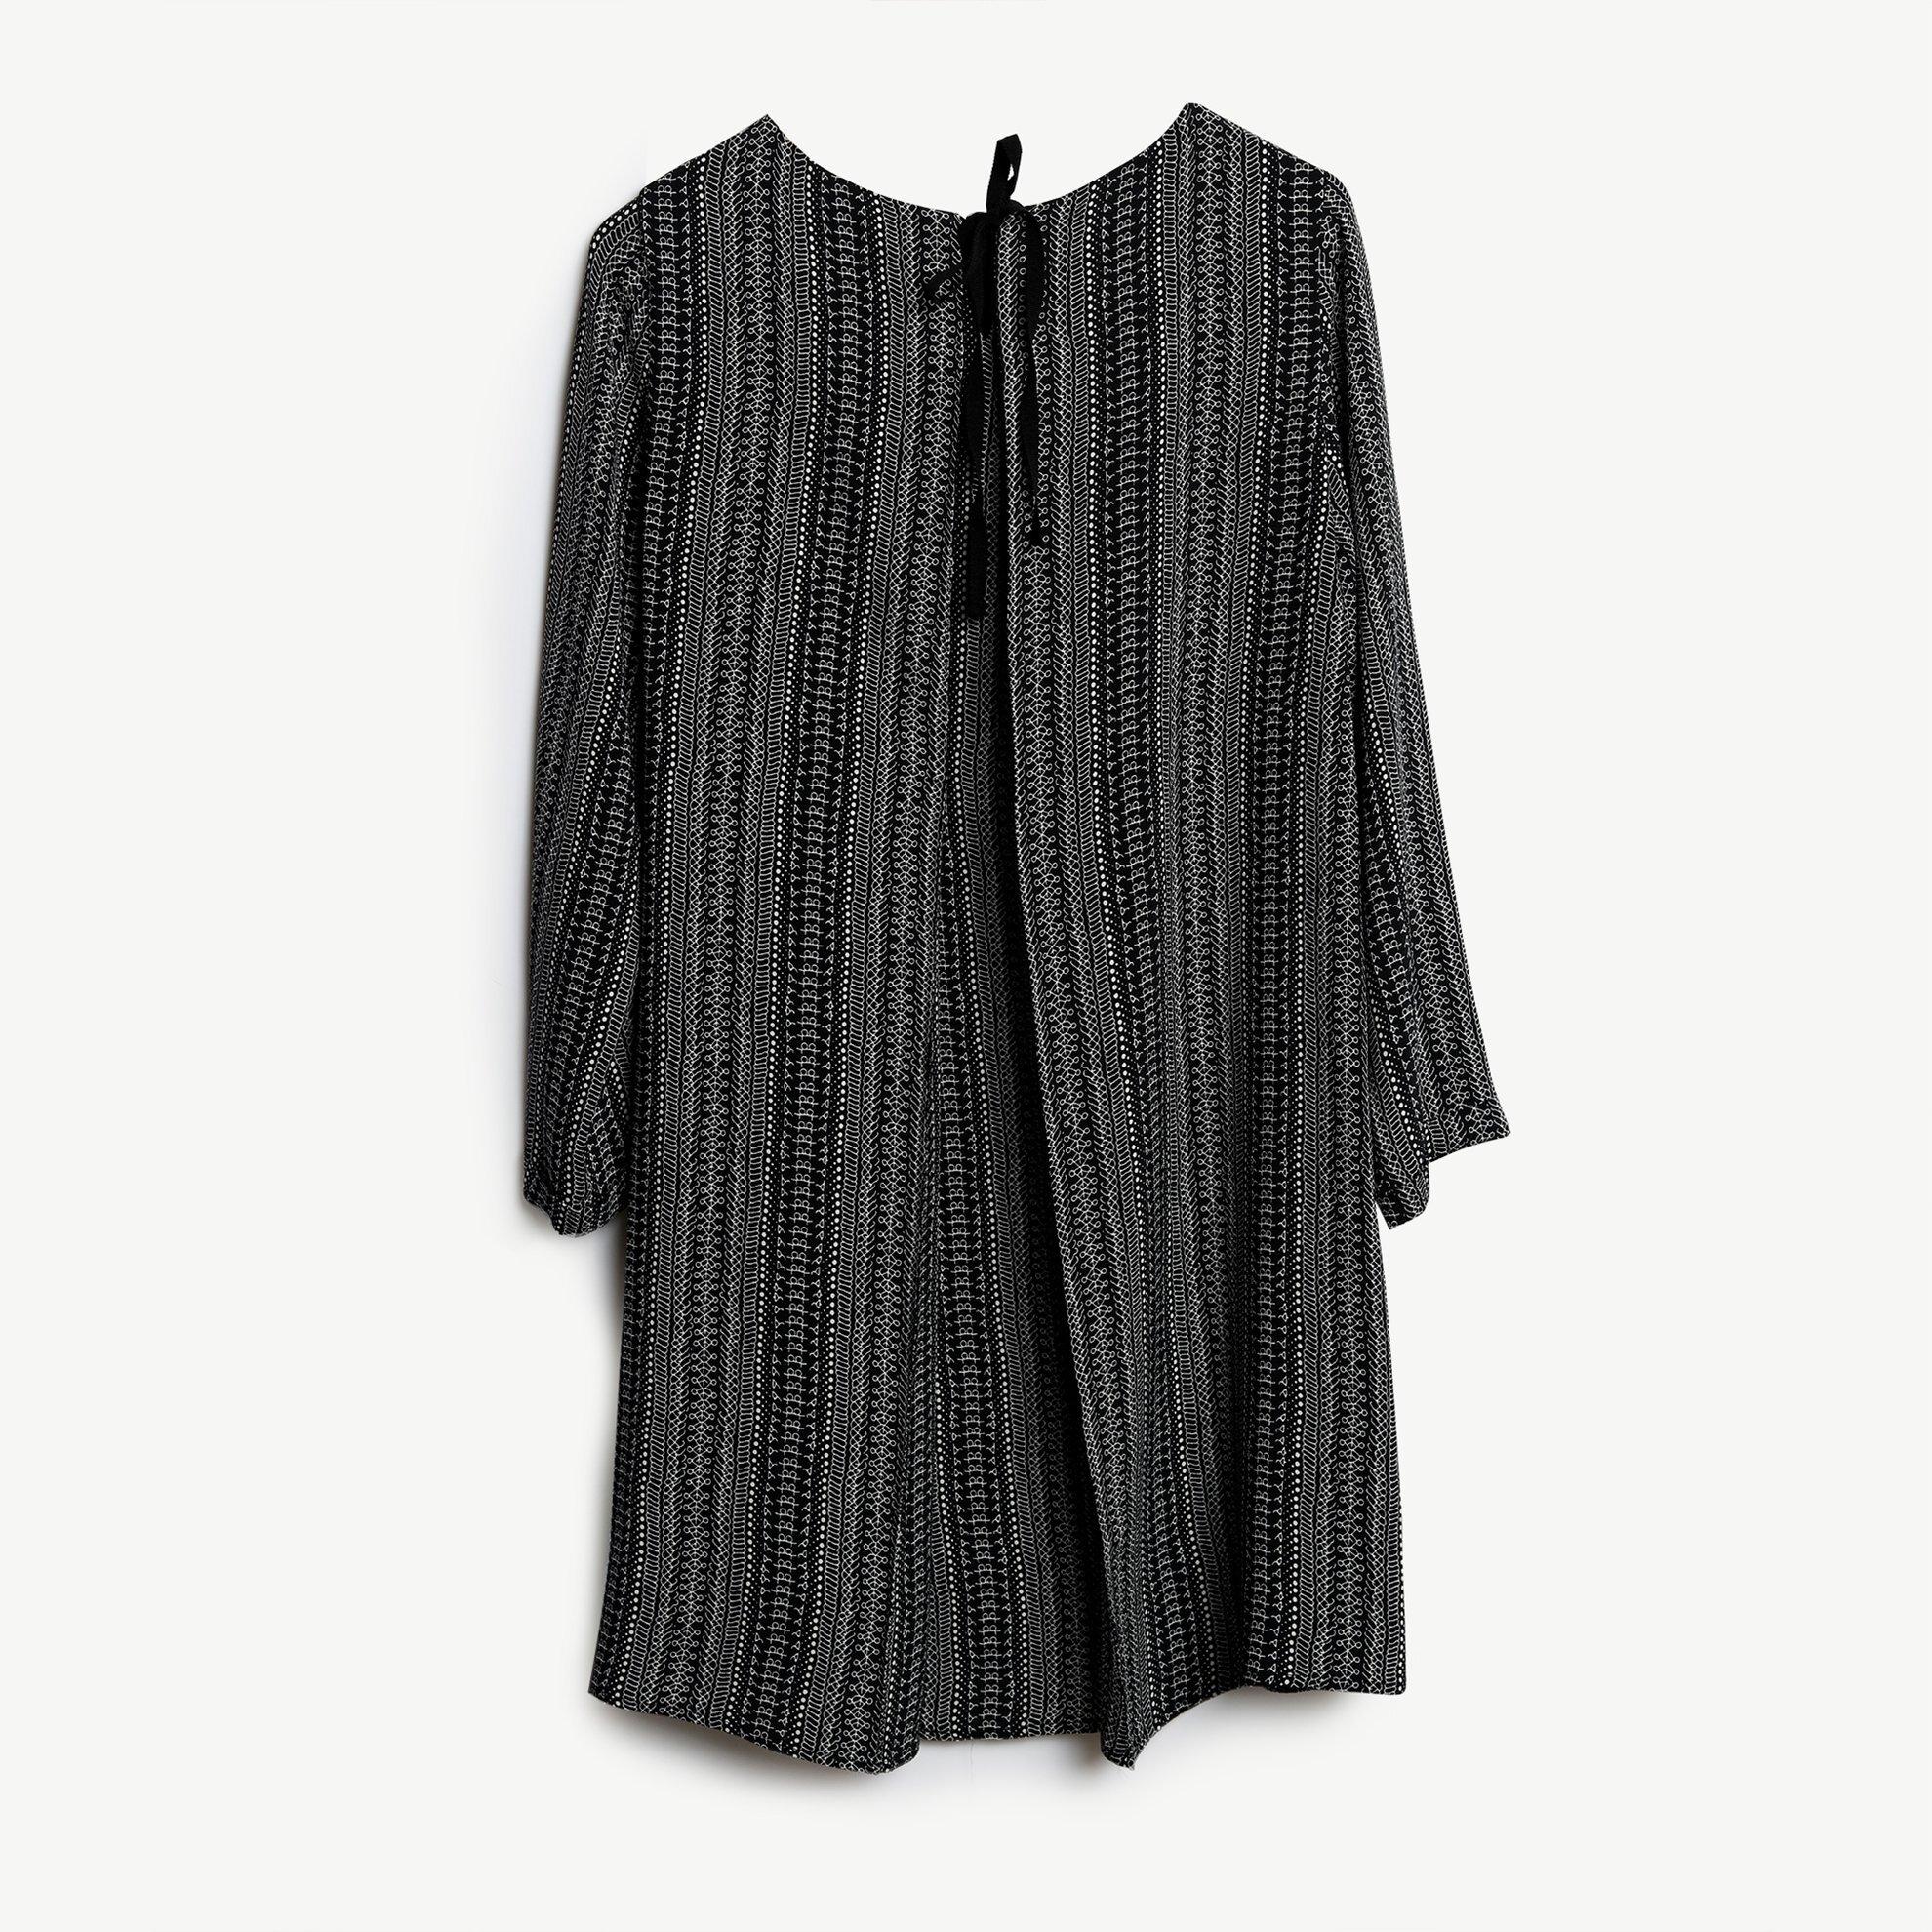 Aline Bow Detailed Dress